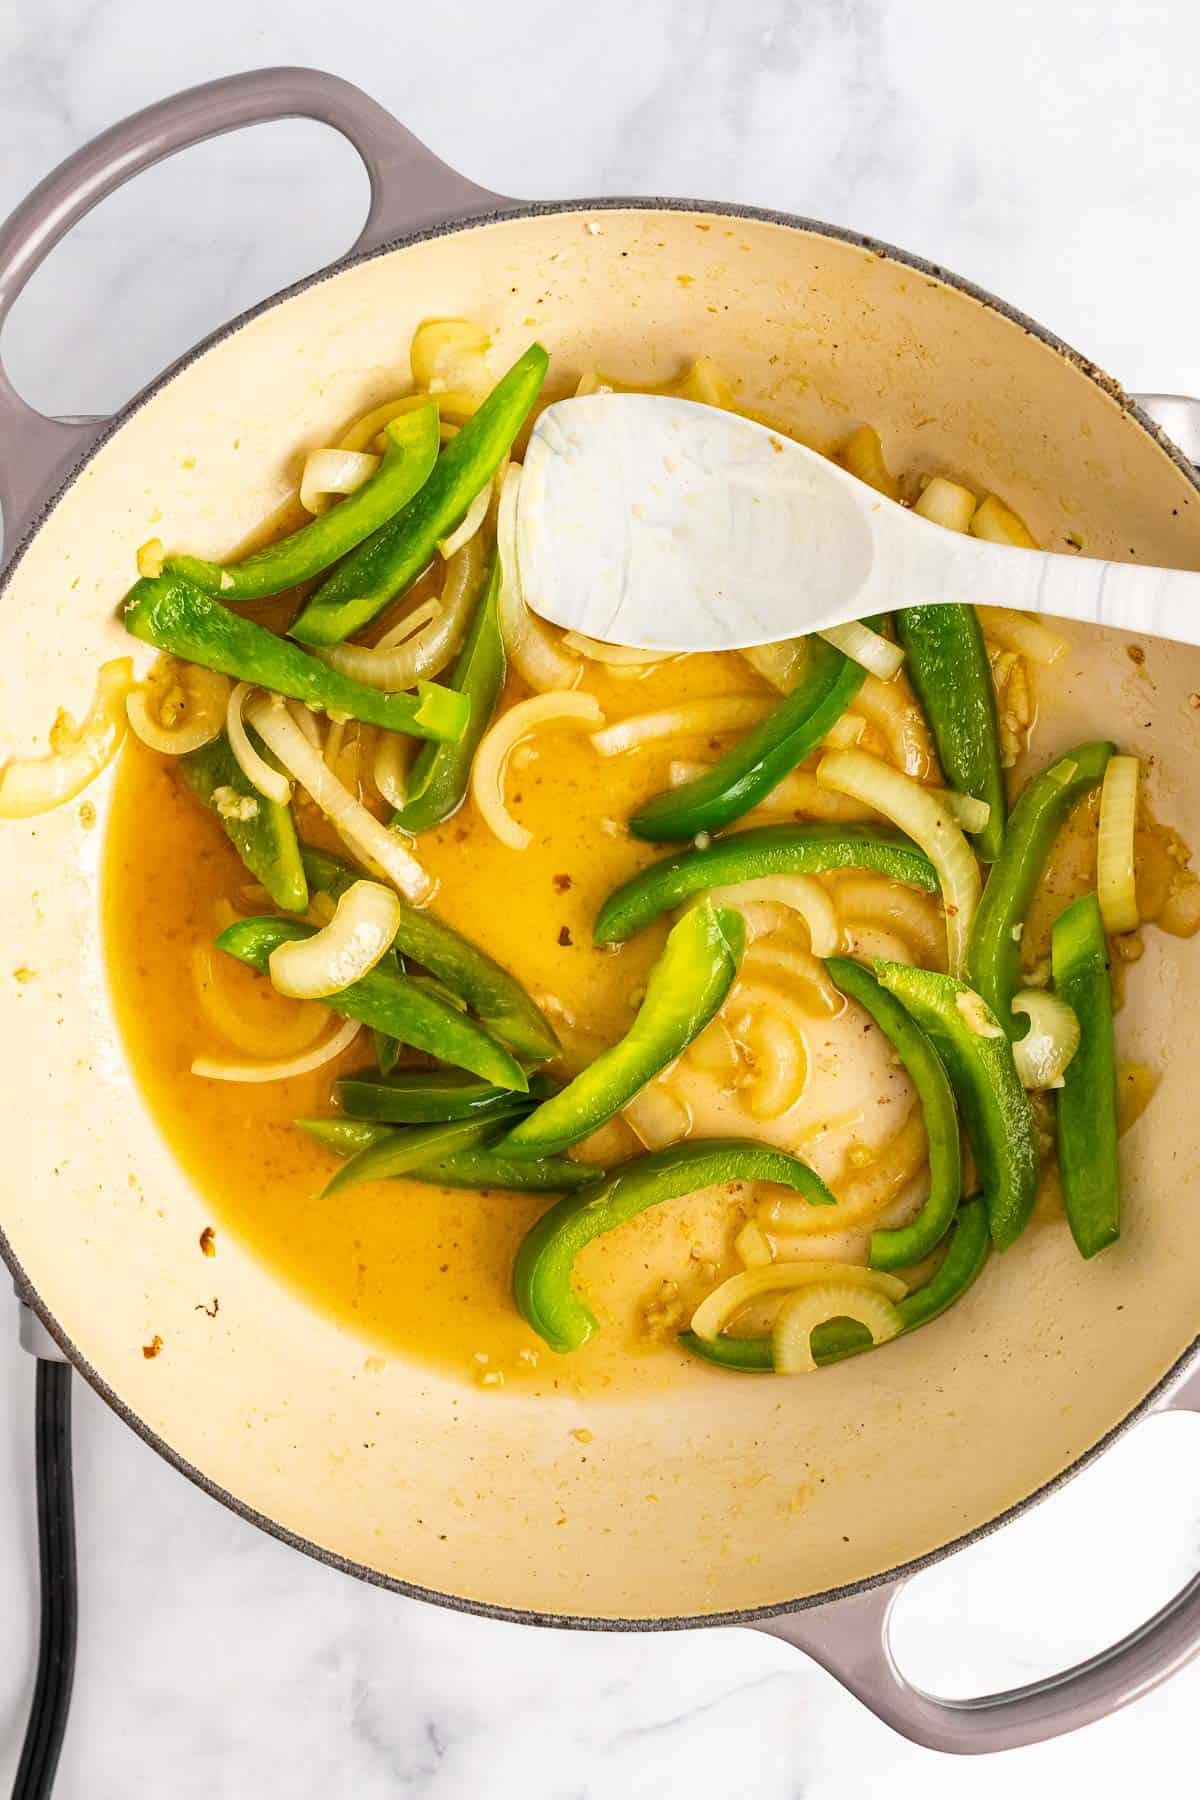 Vegetables and wine simmering in pan